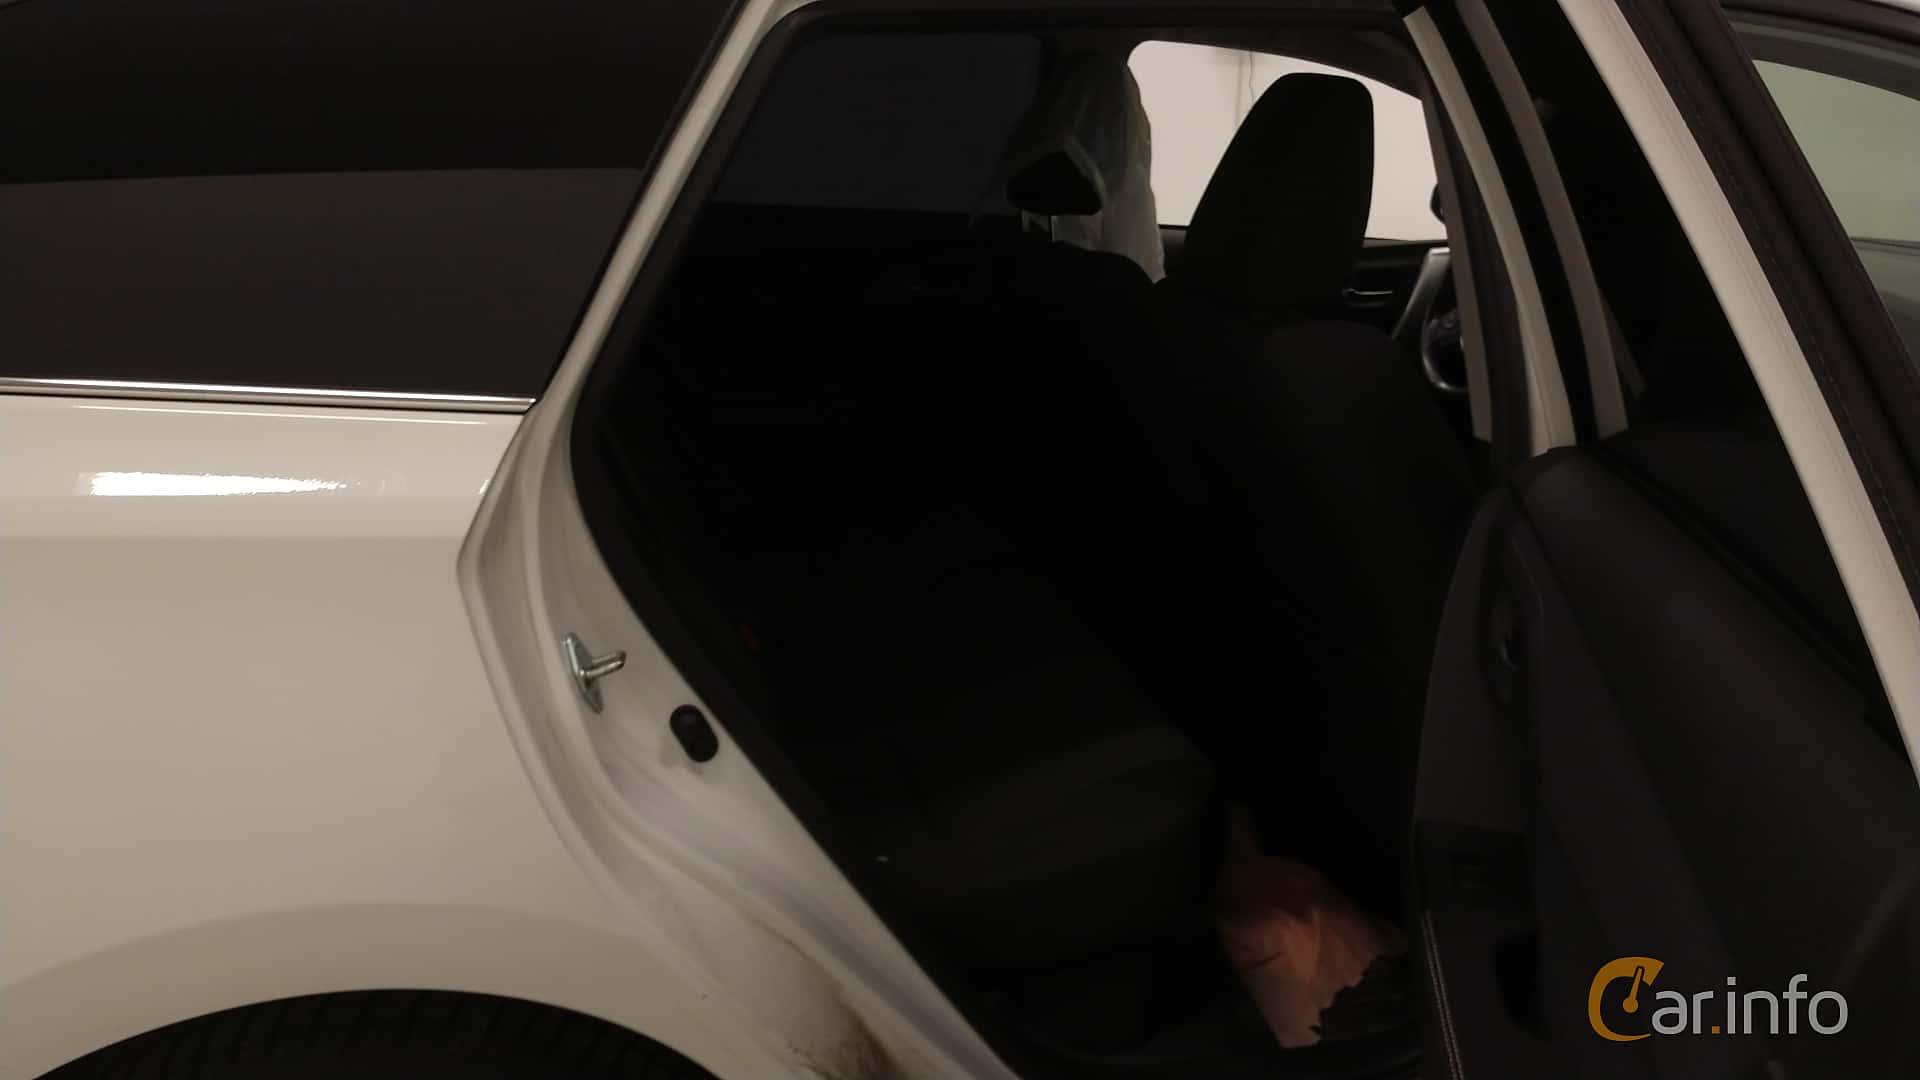 Toyota Auris Touring Sports Hybrid 1.8 VVT-i + 3JM CVT, 136hp, 2014